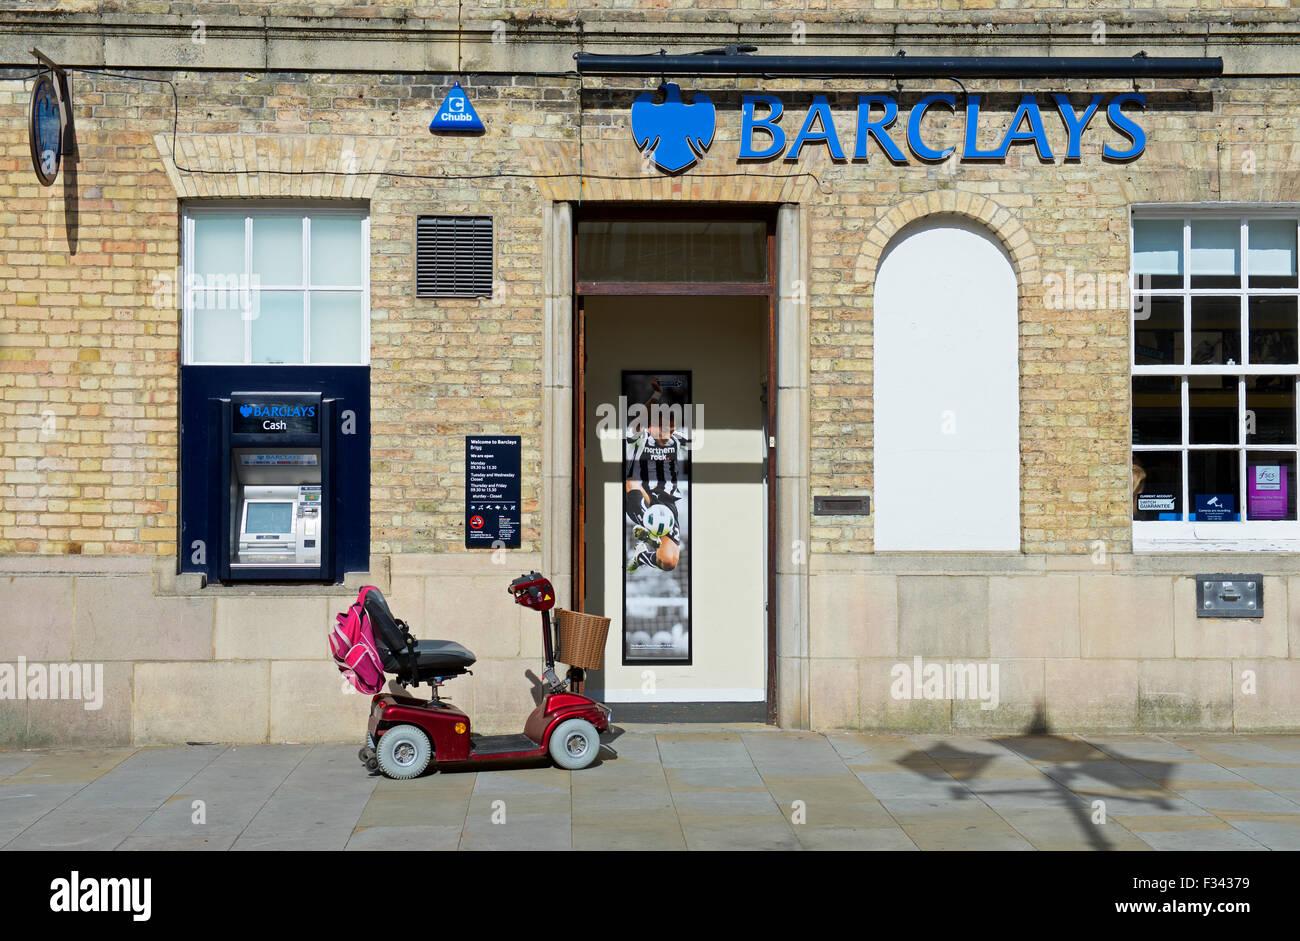 Mobilität Roller außerhalb Barclays Bank, England UK Stockbild